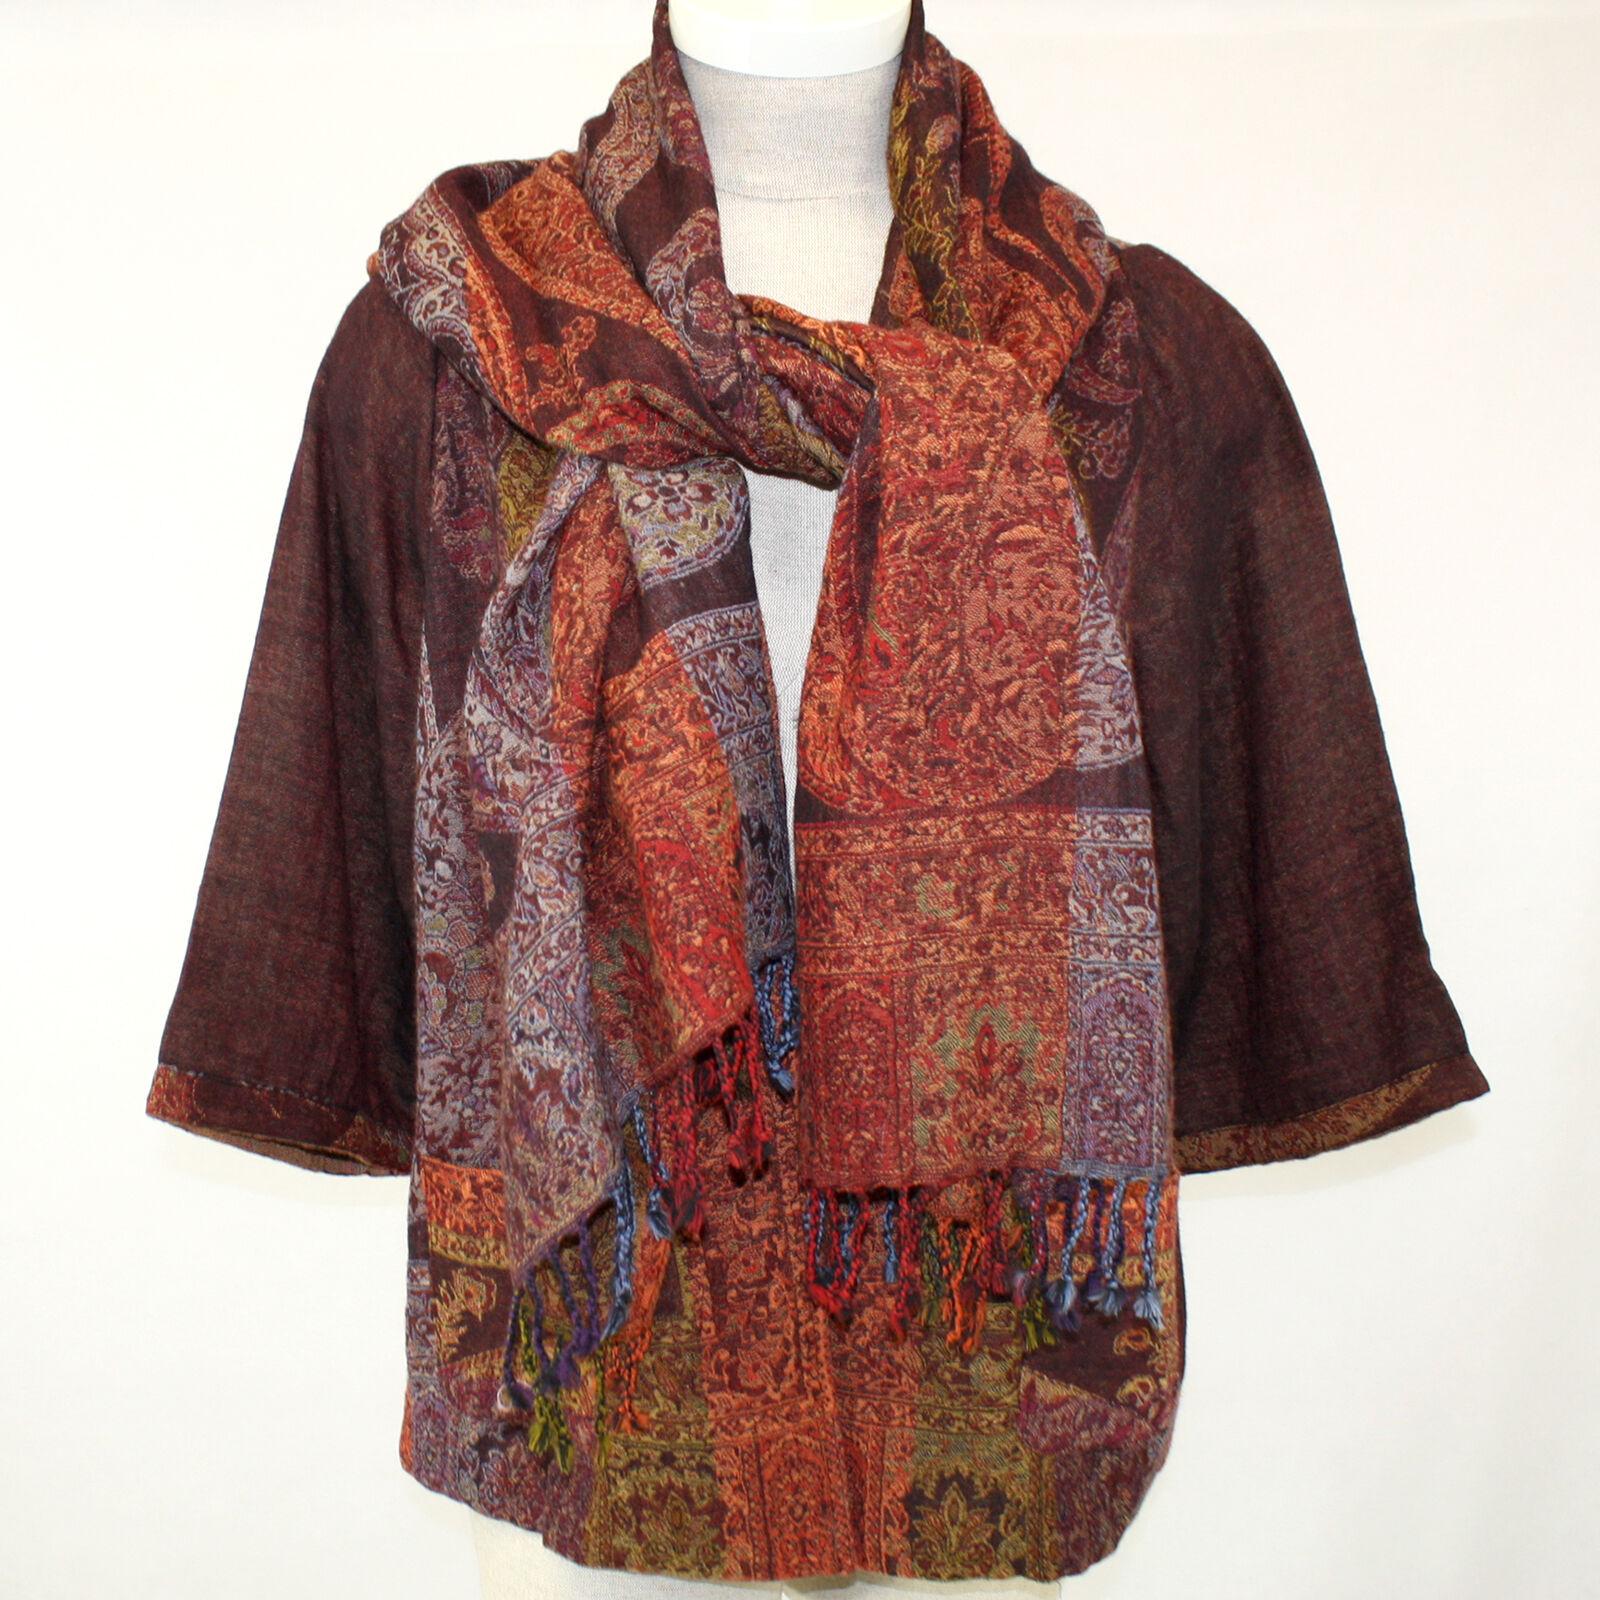 NEW NWT Parsley & Sage Plus Größe Edna Short Jacket 100% Wool Cardigan Blouse 1X